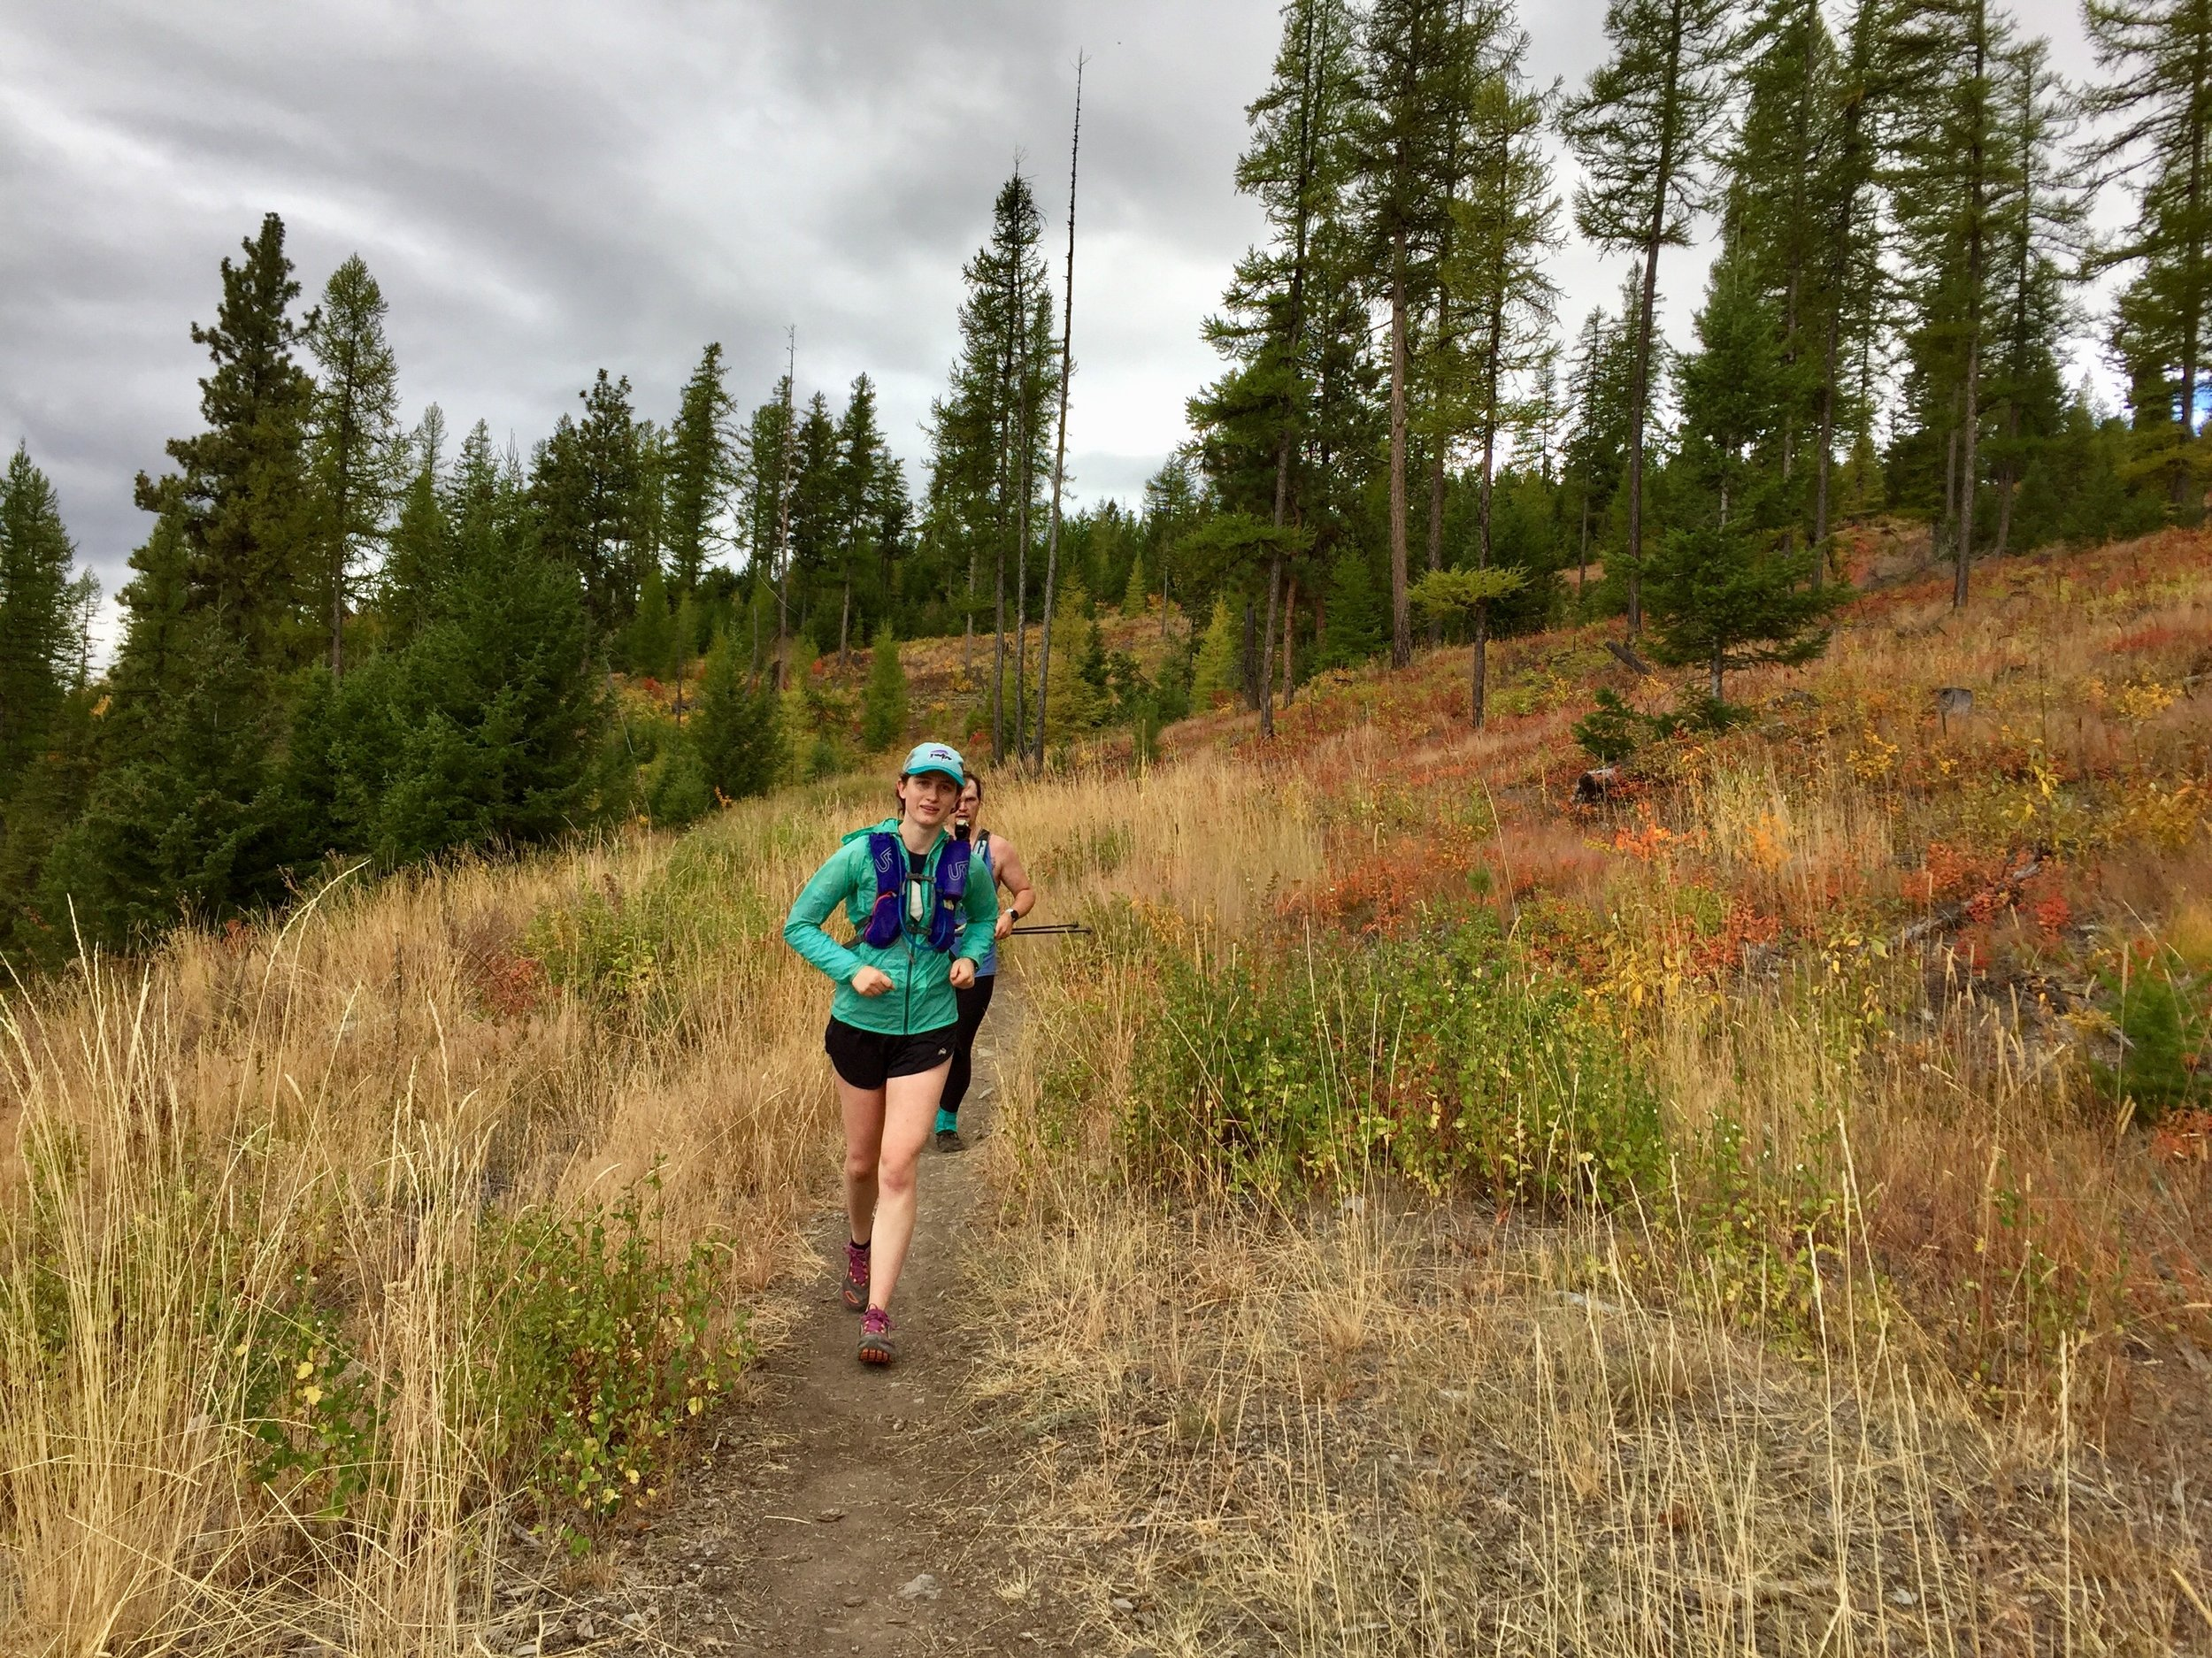 foys to blacktail trails trail marathon ftbtIMG_6659.JPG